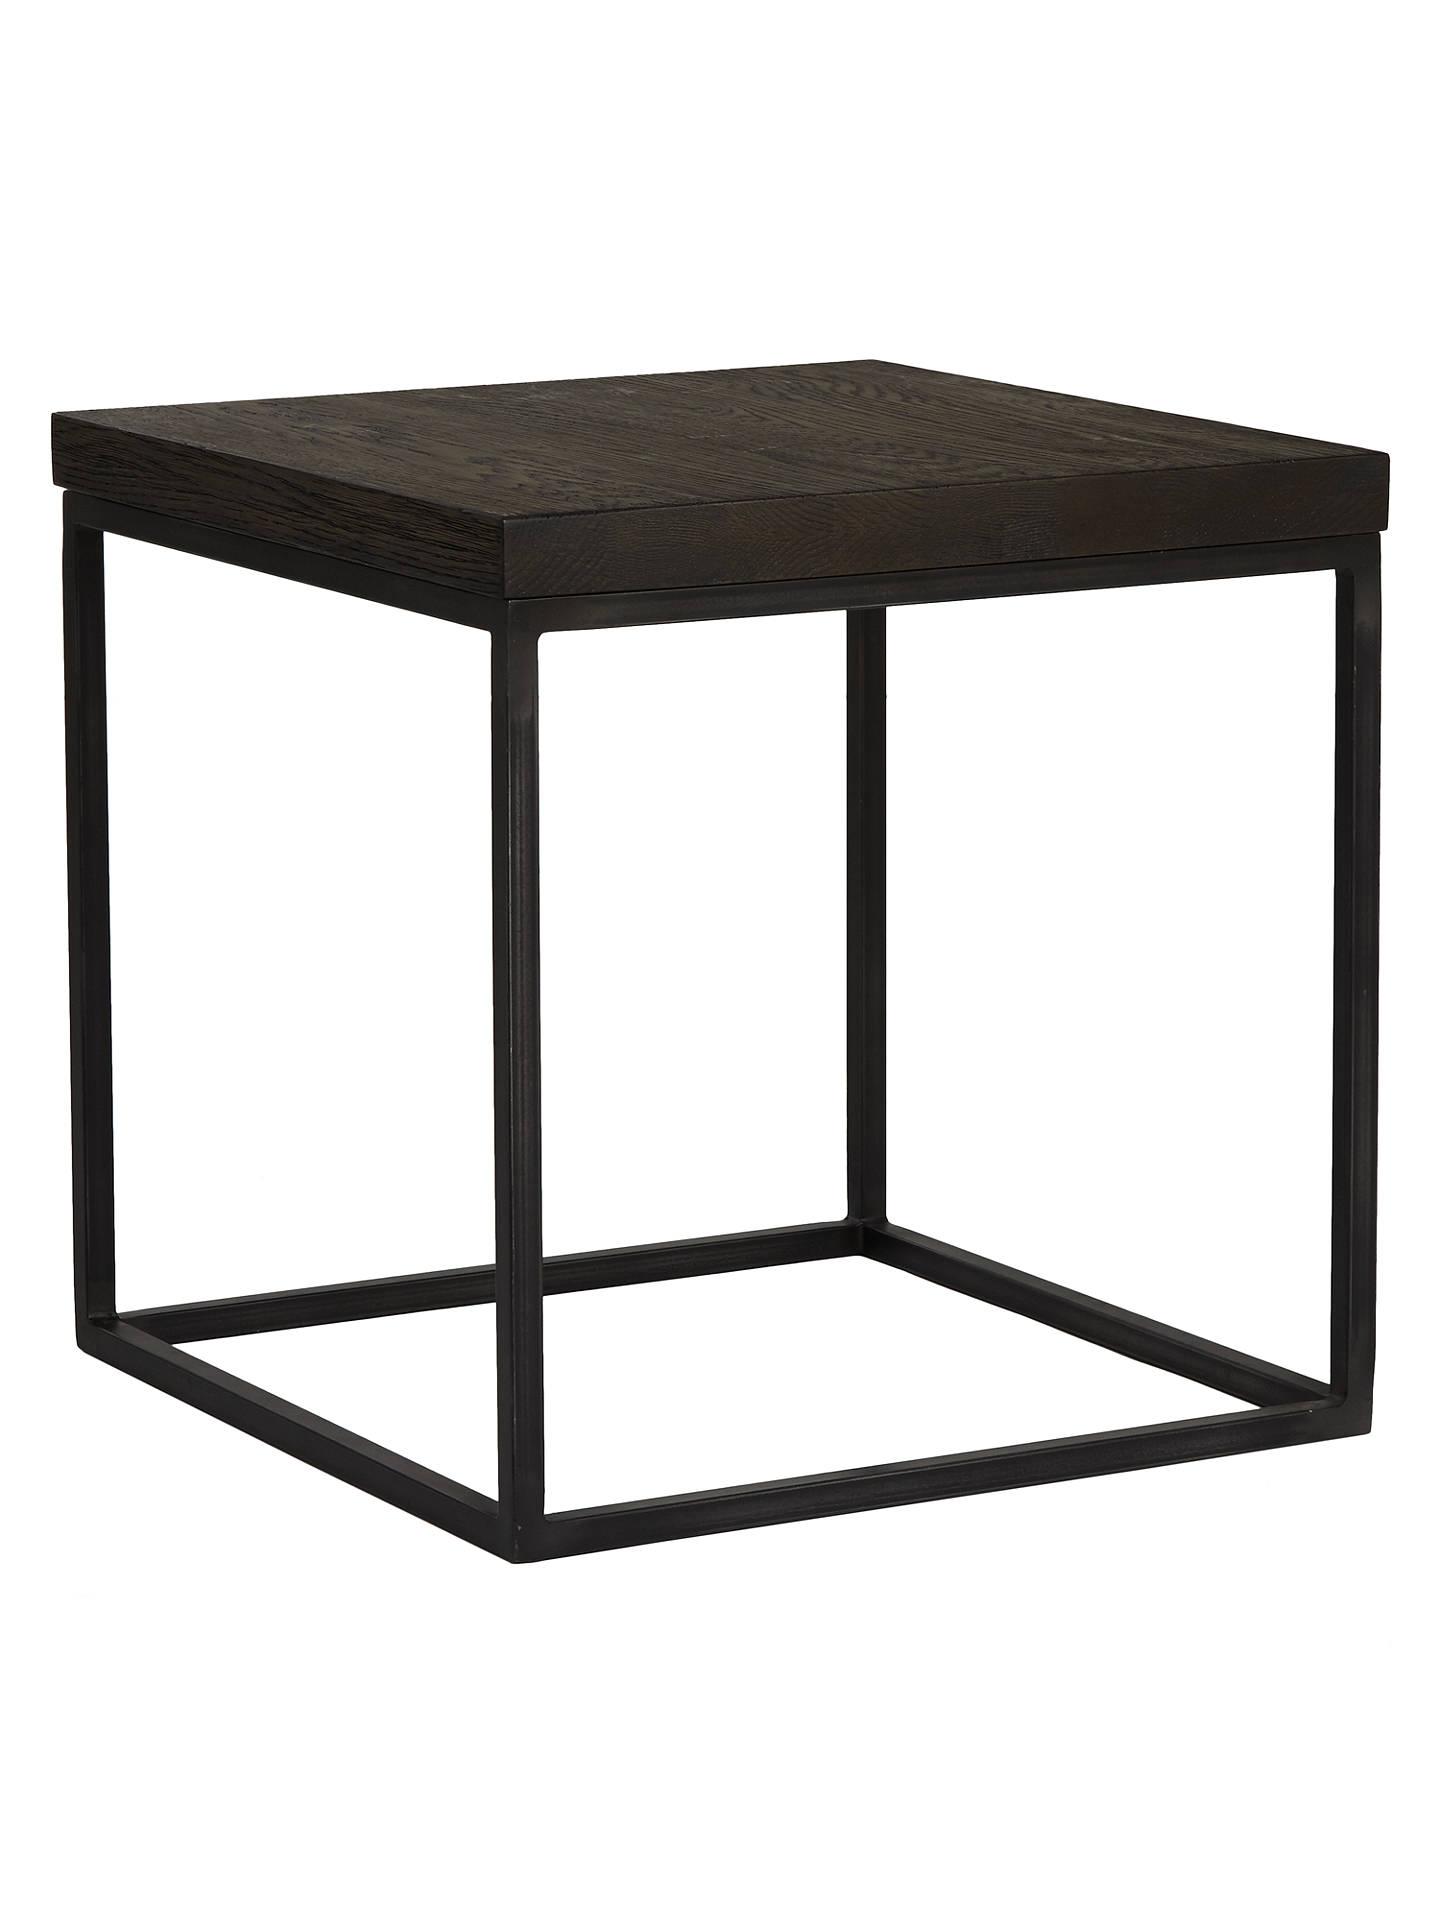 john lewis partners calia side table at john lewis. Black Bedroom Furniture Sets. Home Design Ideas